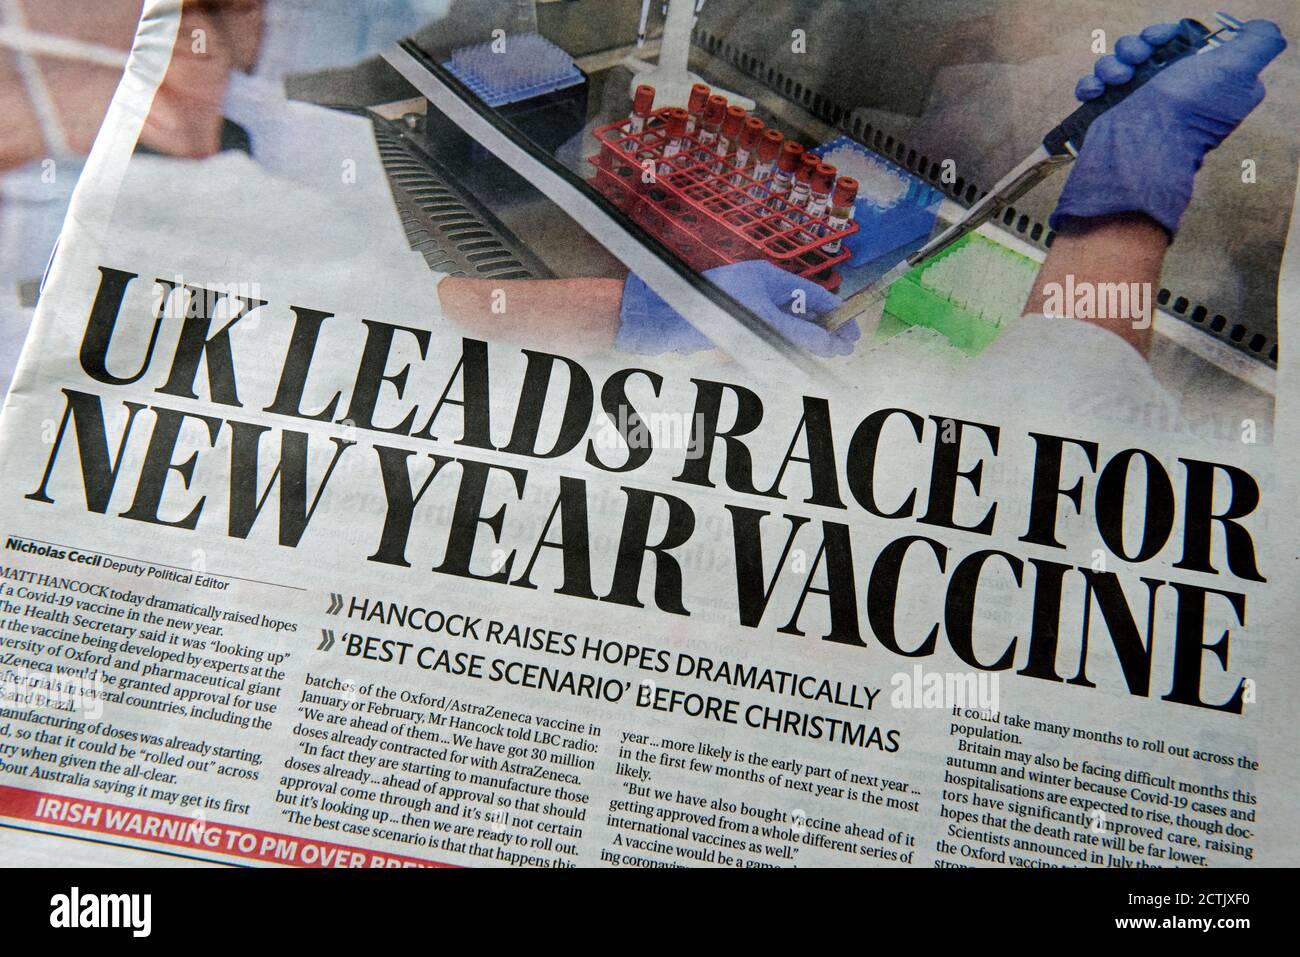 Evening Standard newspaper headline Monday 7th September 2020 - UK Leads Race for New Year Vaccine - to vaccinate against Coronavirus, Corvid19 Stock Photo